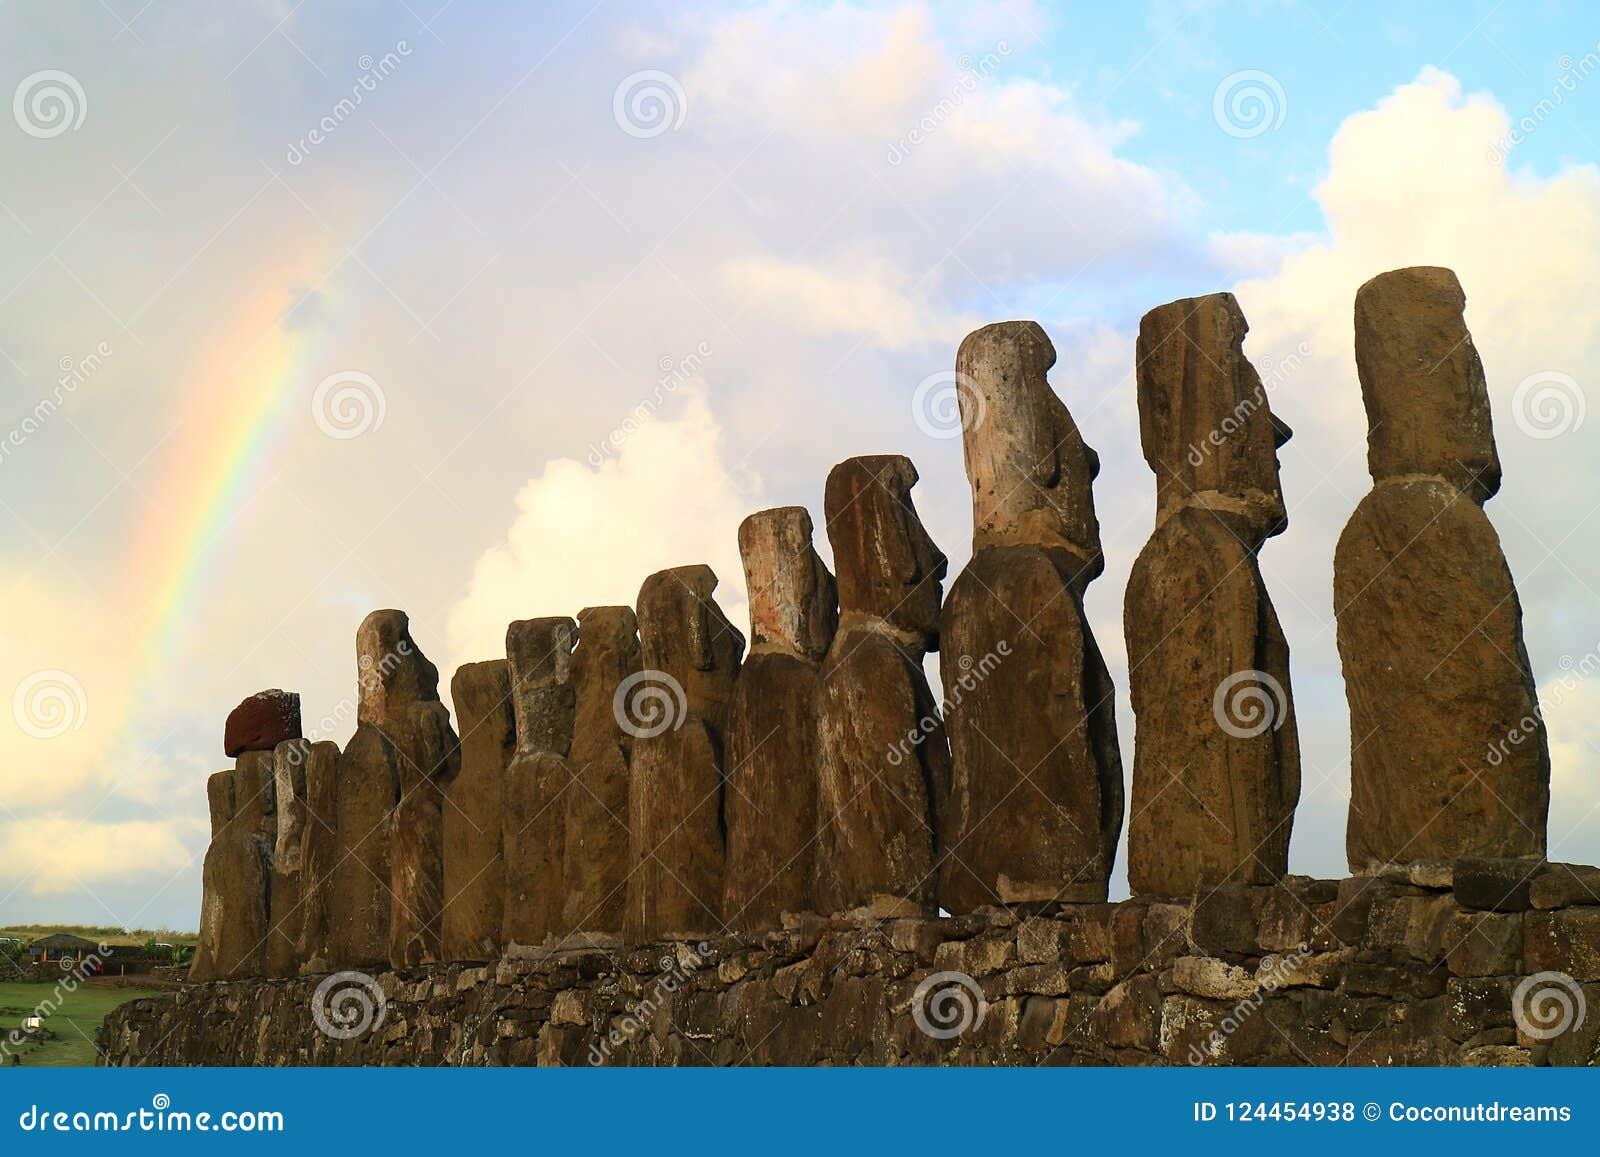 Monolithic Moai Statue At Ahu Tongariki, Easter Island, Ch